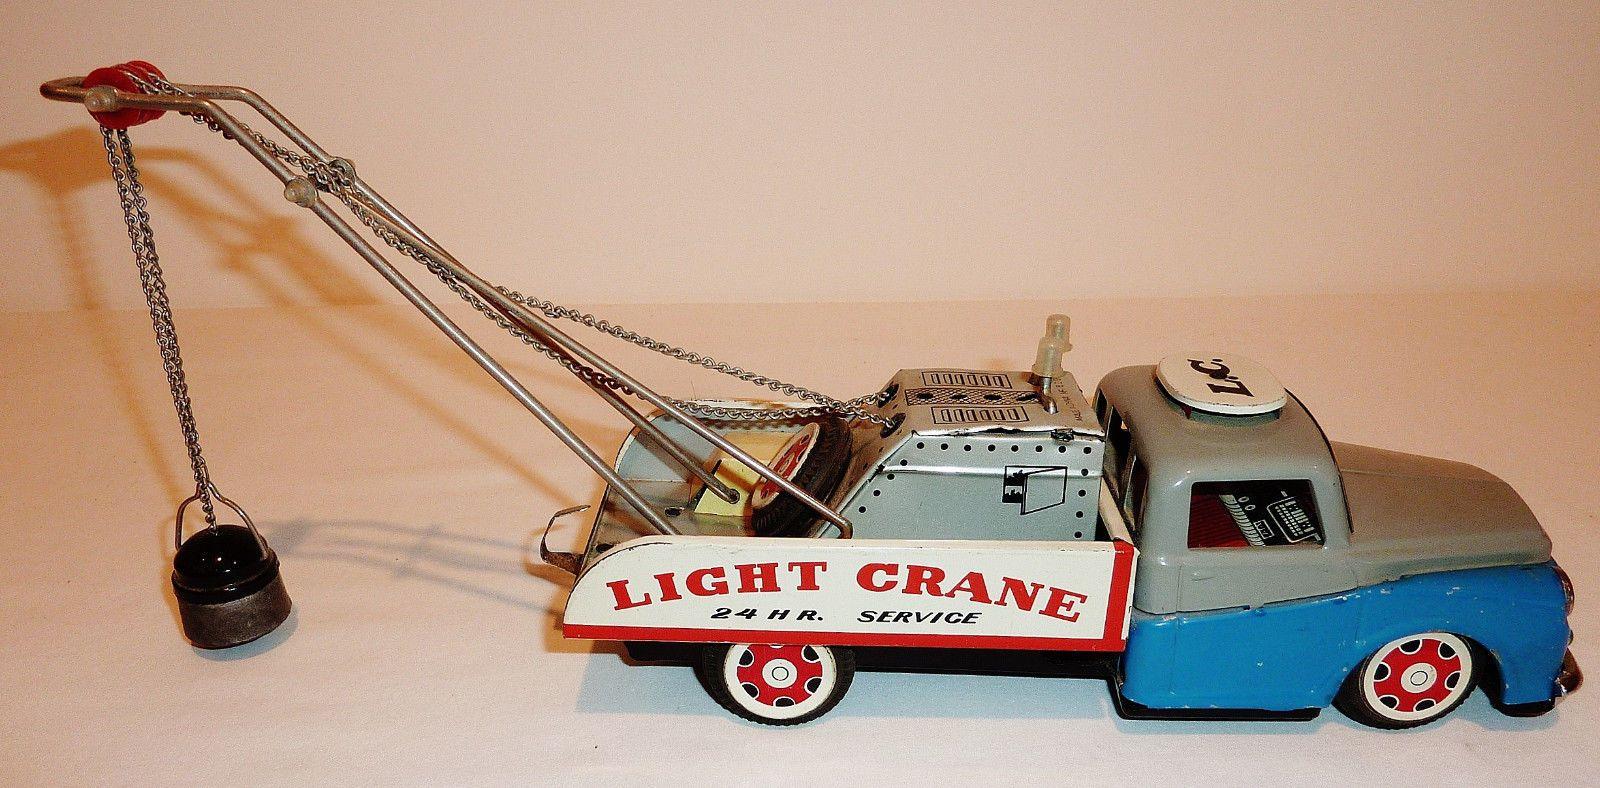 1960 toys images  VINTAGE  MADE IN CHINA Tin Litho Friction  LIGHT CRANE